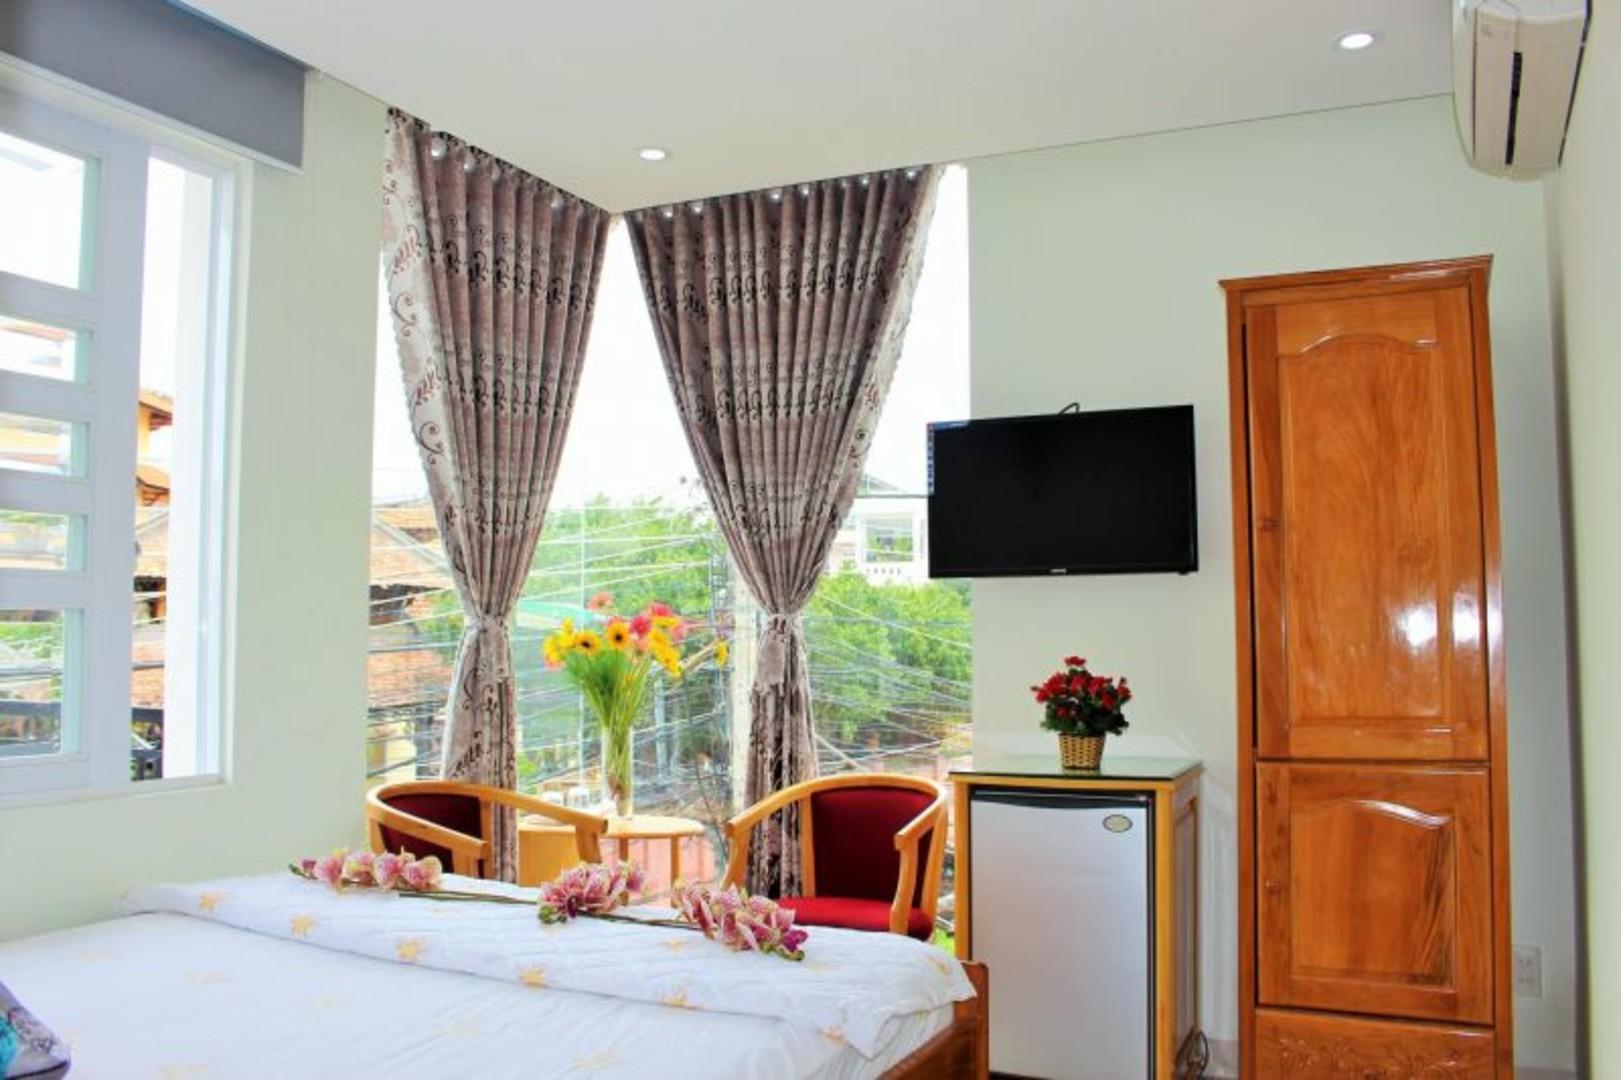 ivory-coast-hotel-111.jpg